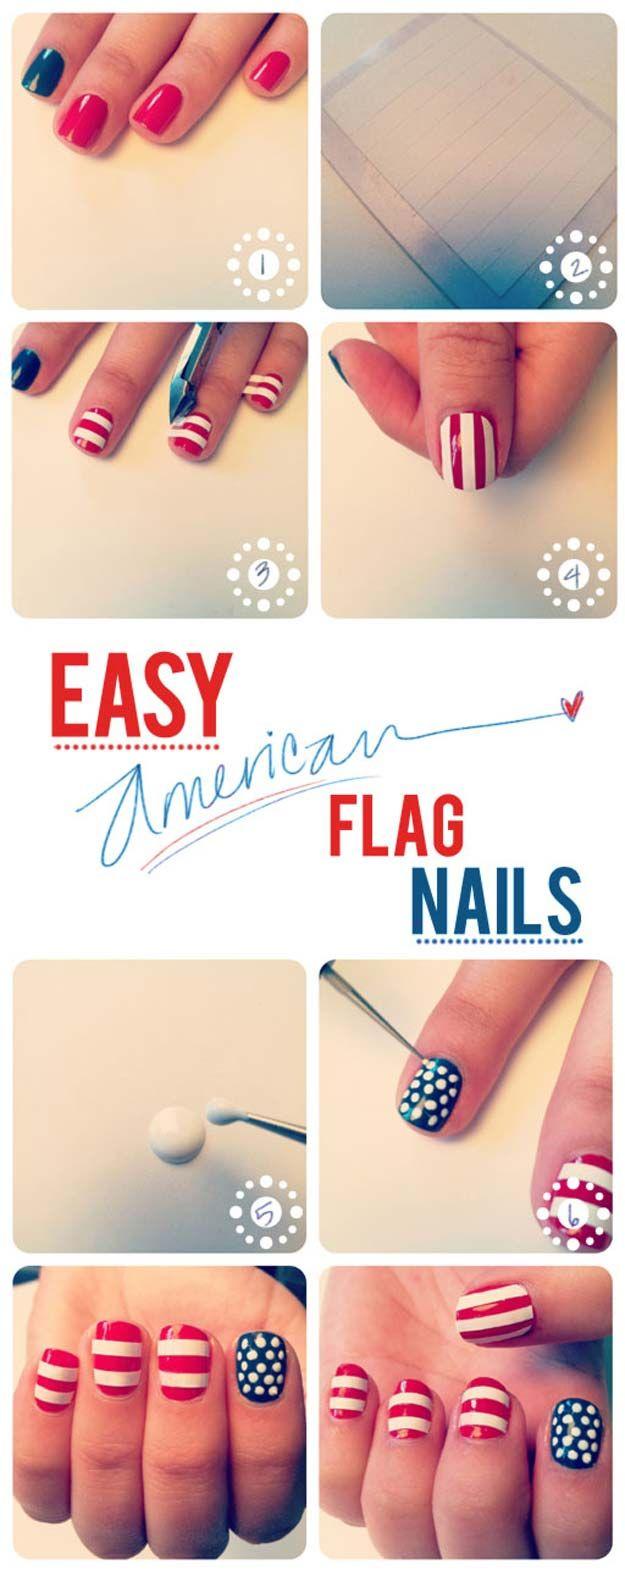 Nail Art Ideas nail art tricks : Best 25+ DIY nails stripes ideas on Pinterest | Nail art tricks ...